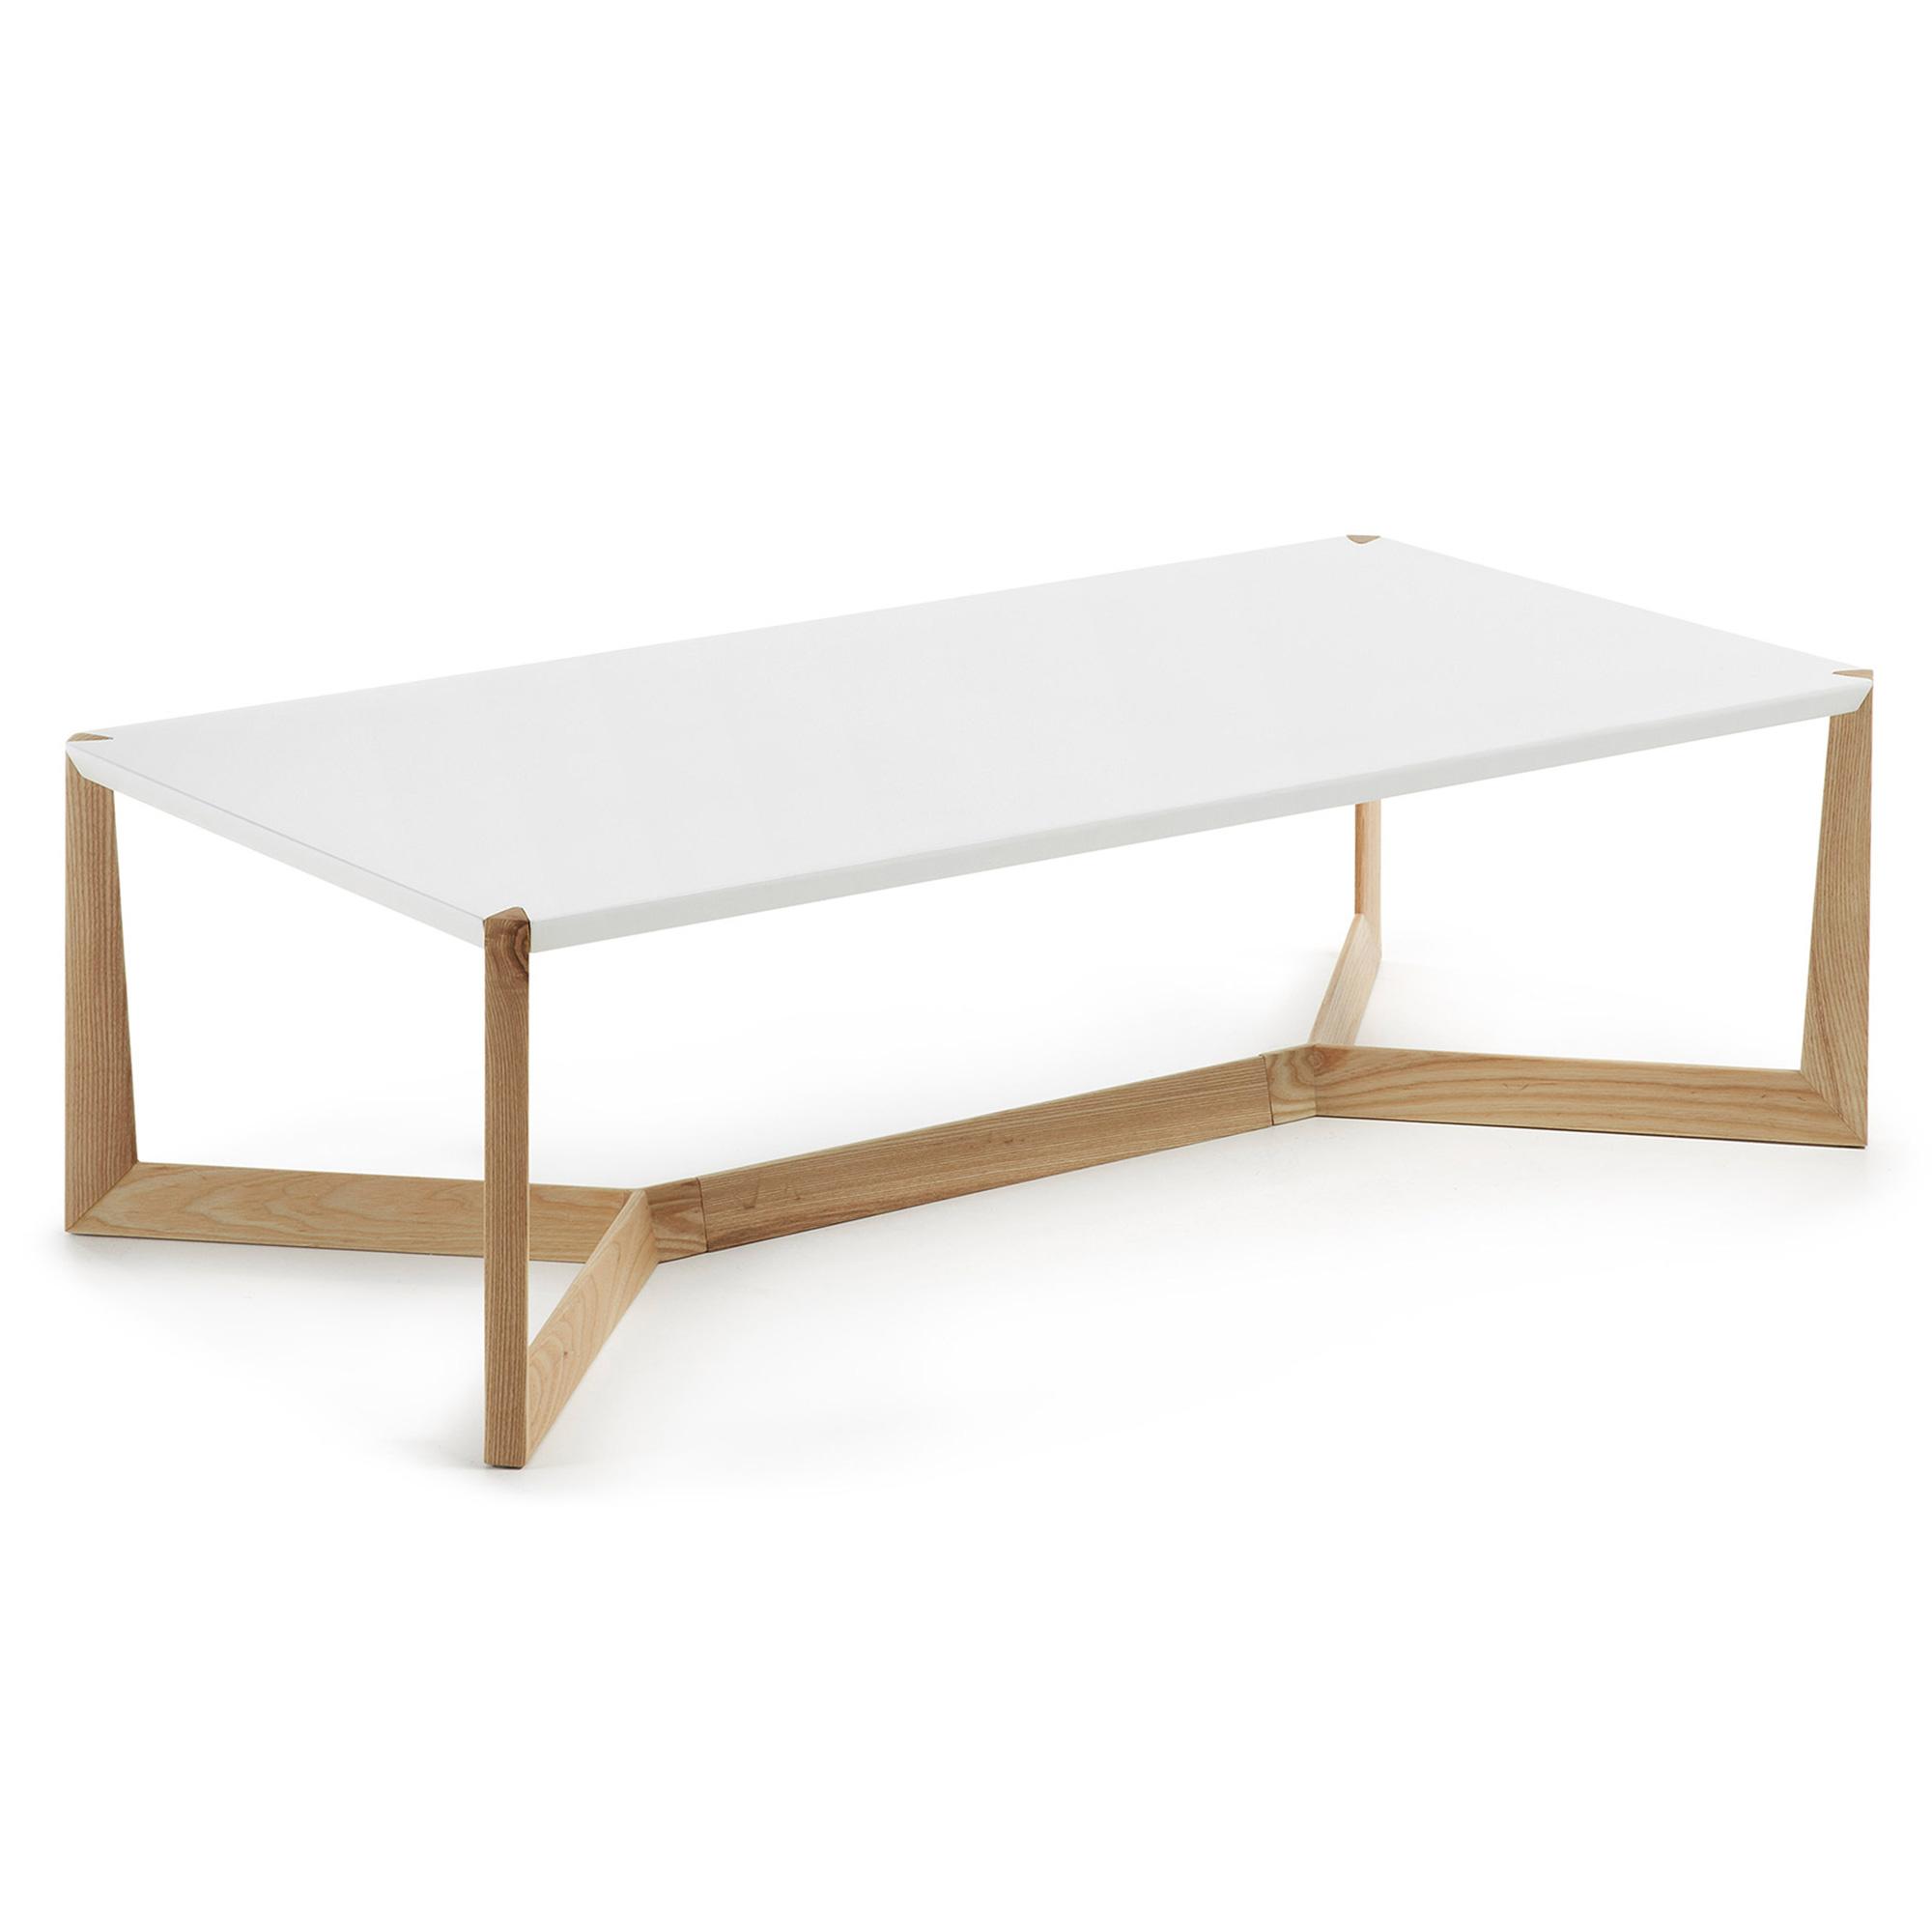 laforma Laforma duplex sofabord - hvid/natur træ, rektangulær (120x60) fra boboonline.dk